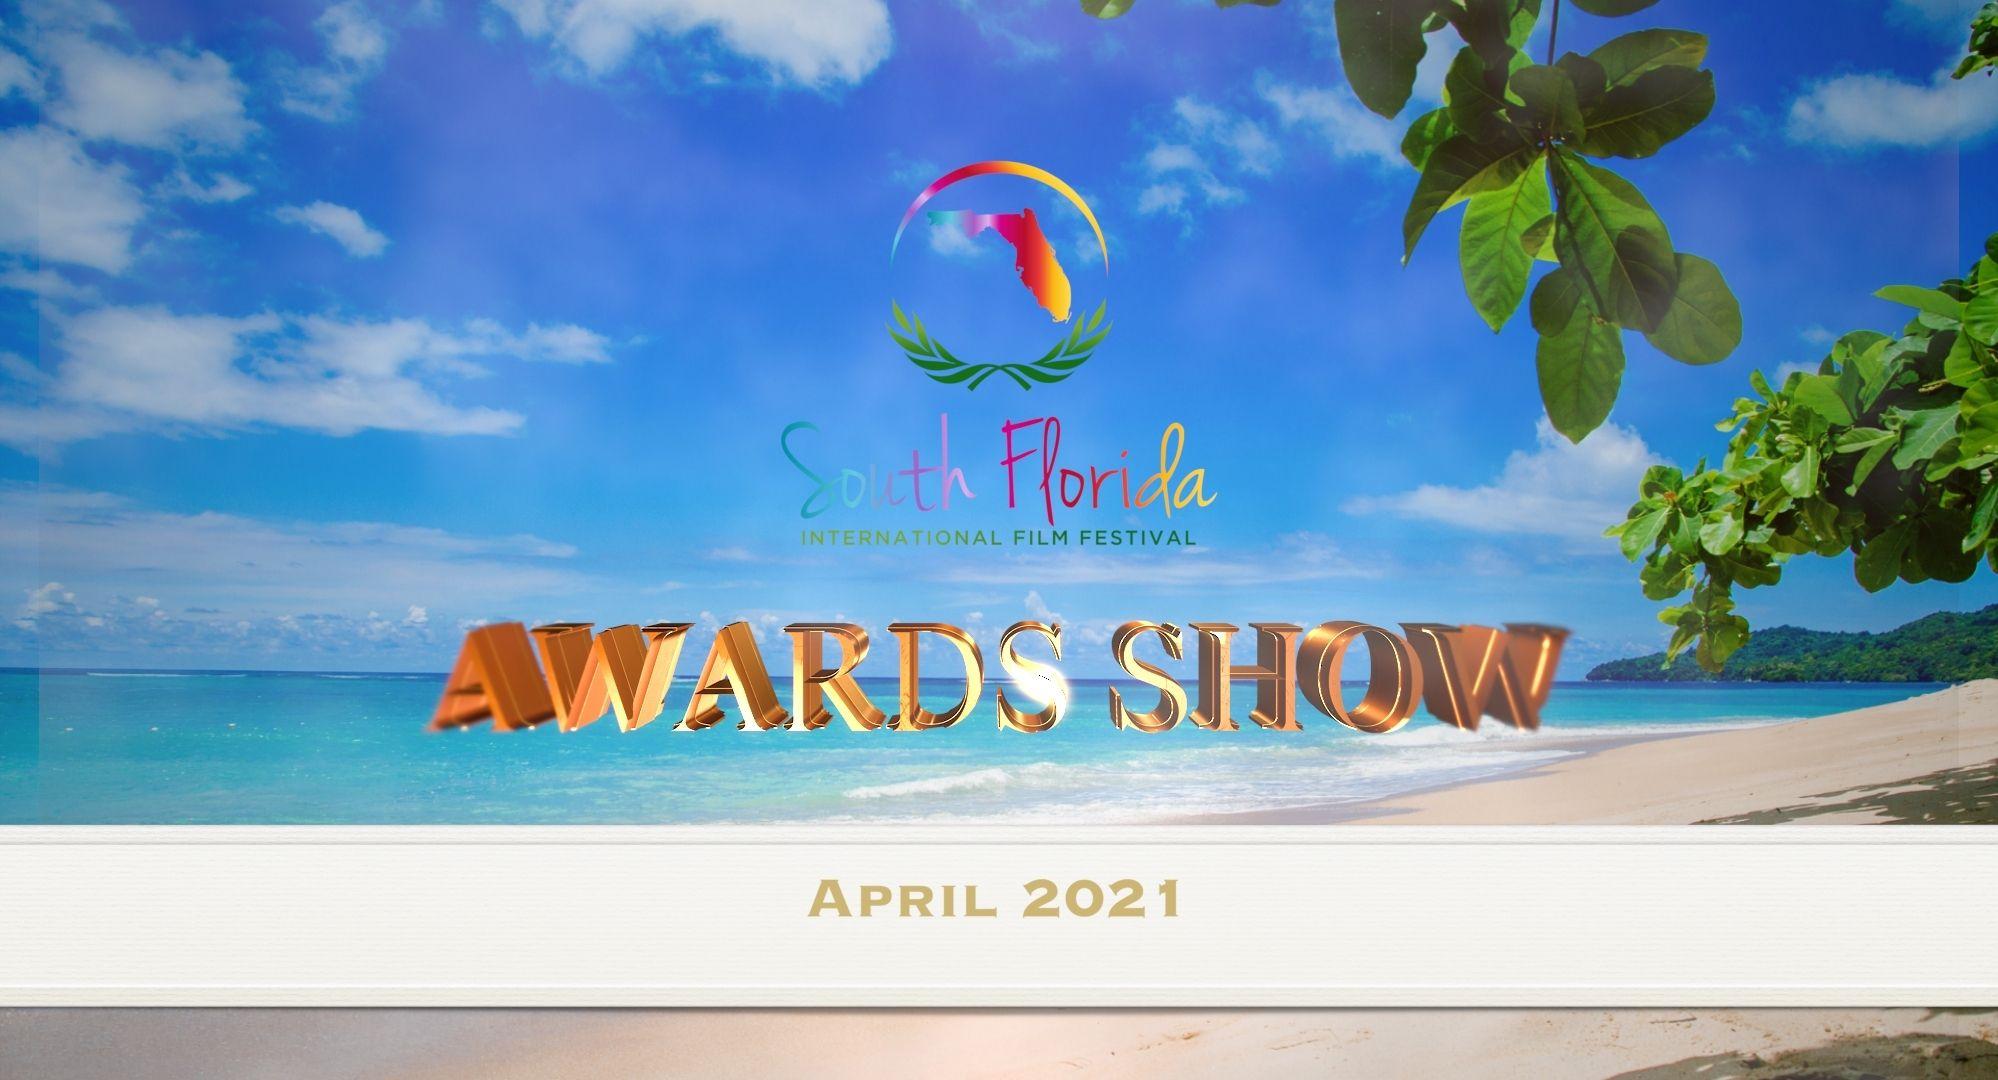 Awards Show - South Florida Int'l Film Festival